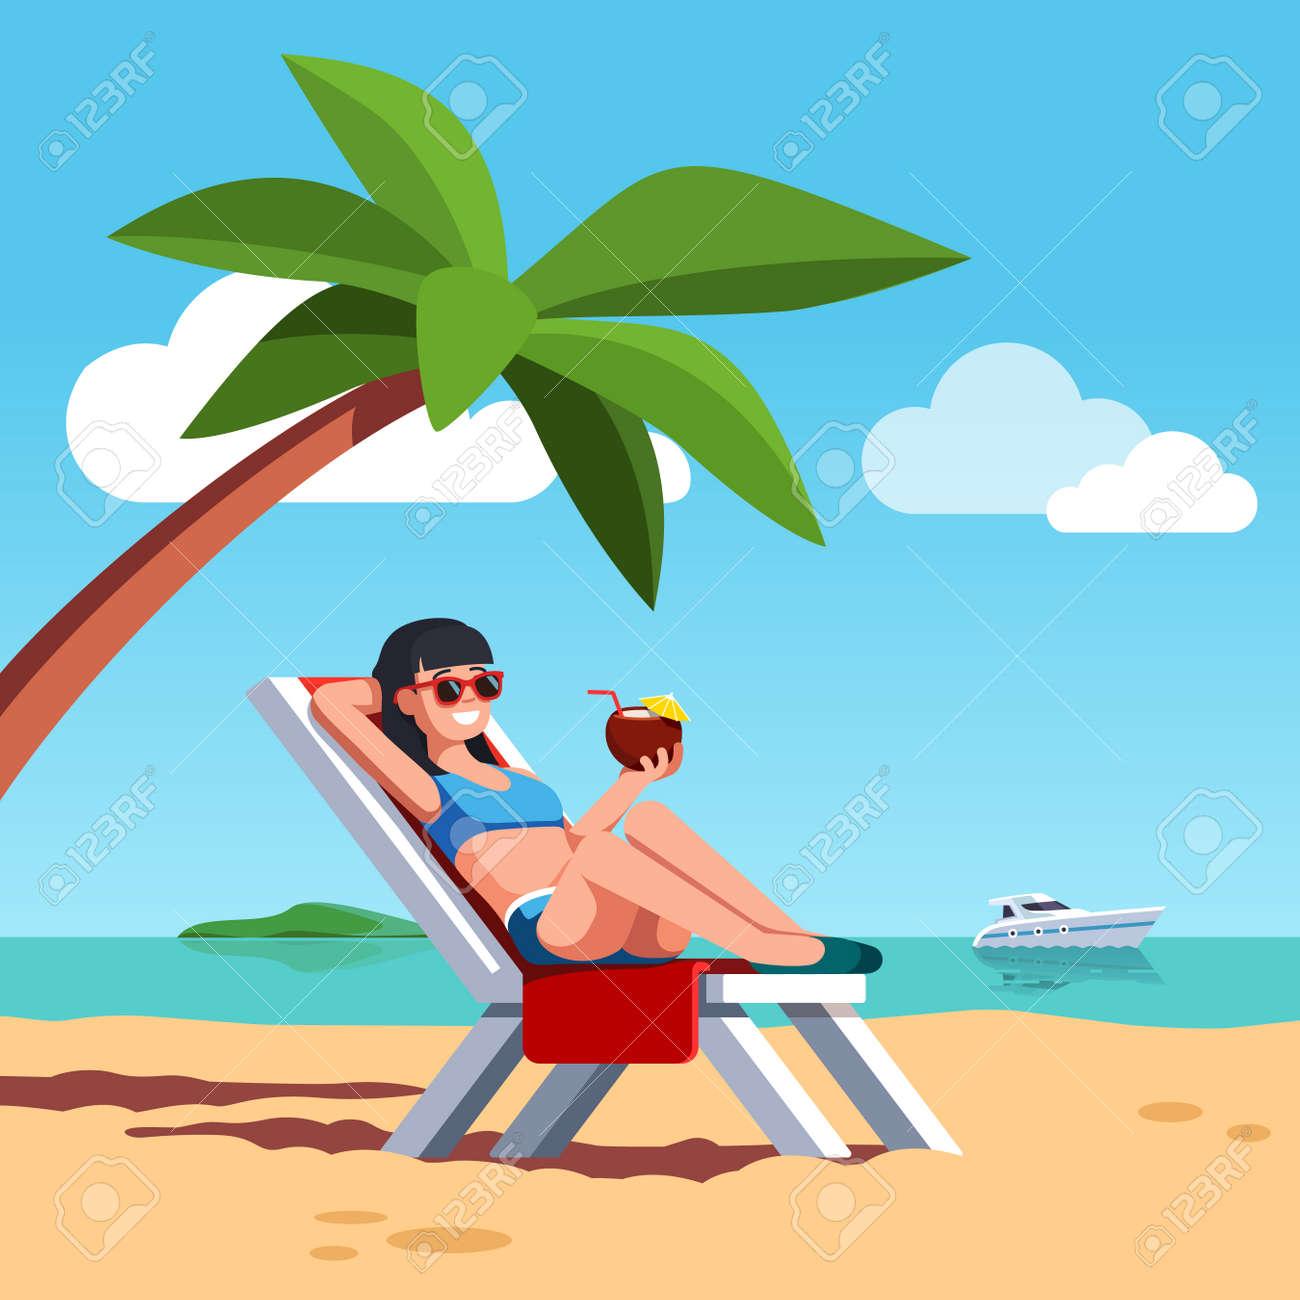 Woman in swimsuit sunbathing at beach. - 96325804